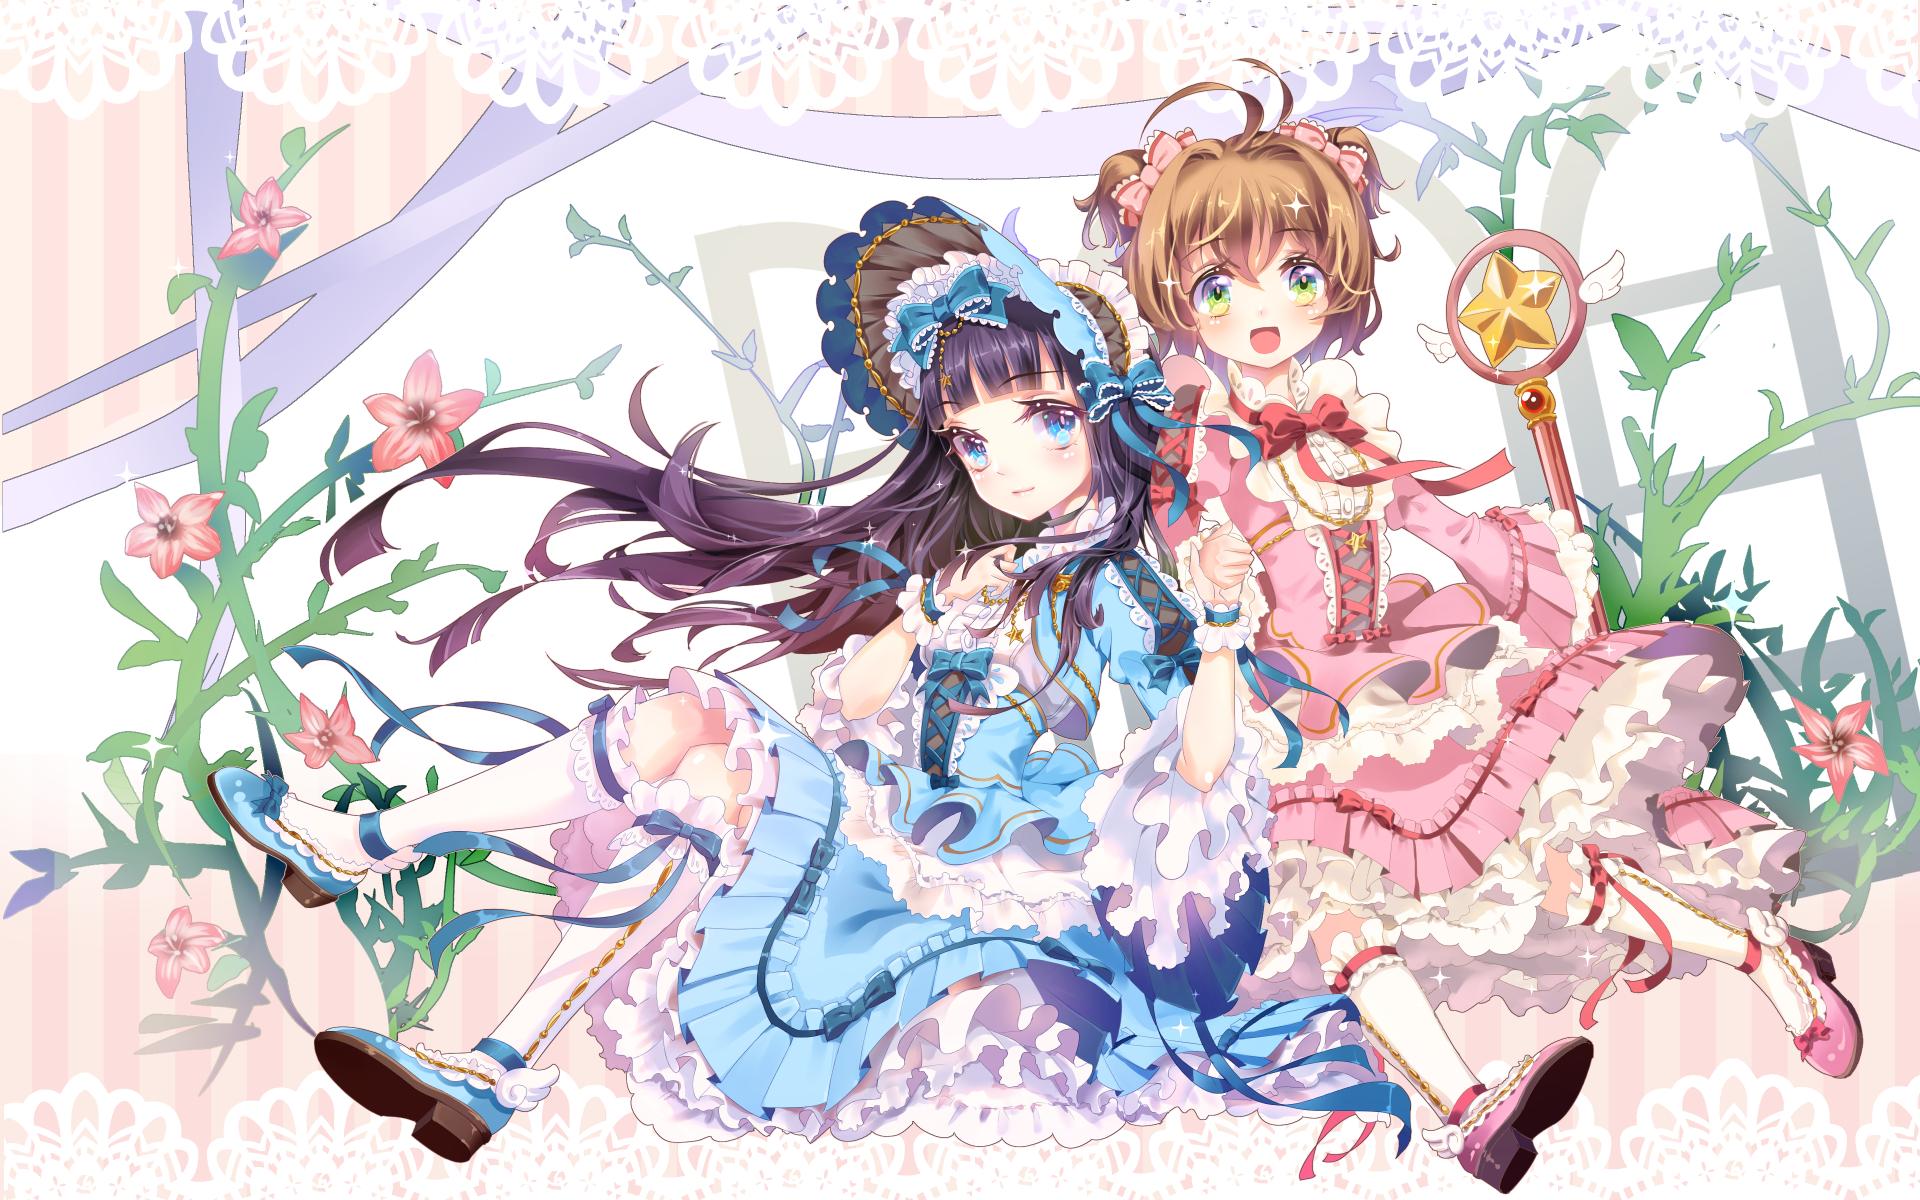 Cardcaptor sakura wallpaper zerochan anime image board - Cardcaptor sakura wallpaper ...